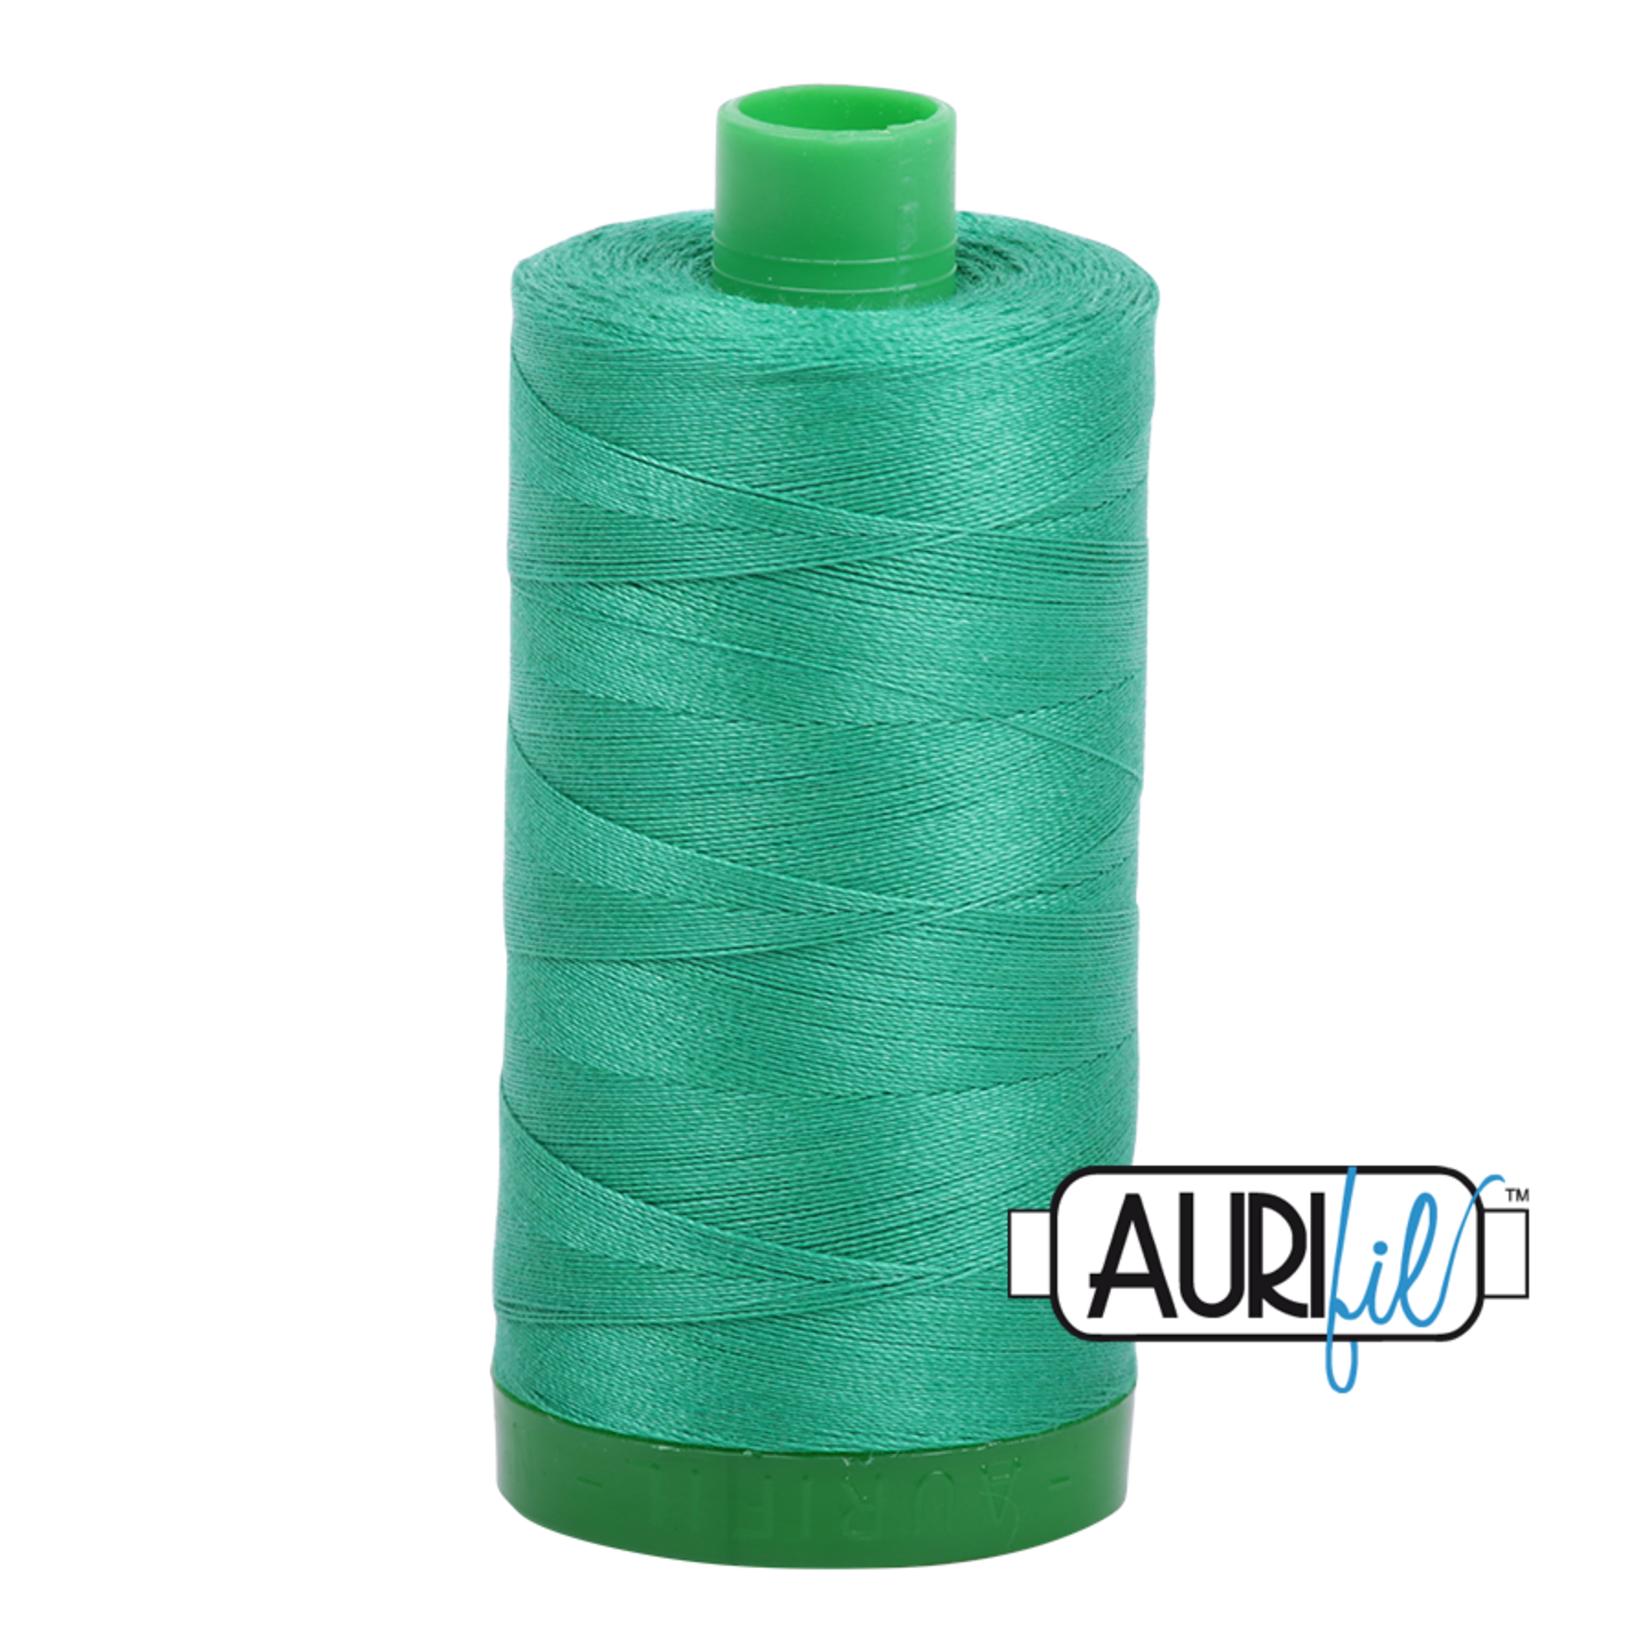 AURIFIL AURIFIL 40 WT Emerald 2865